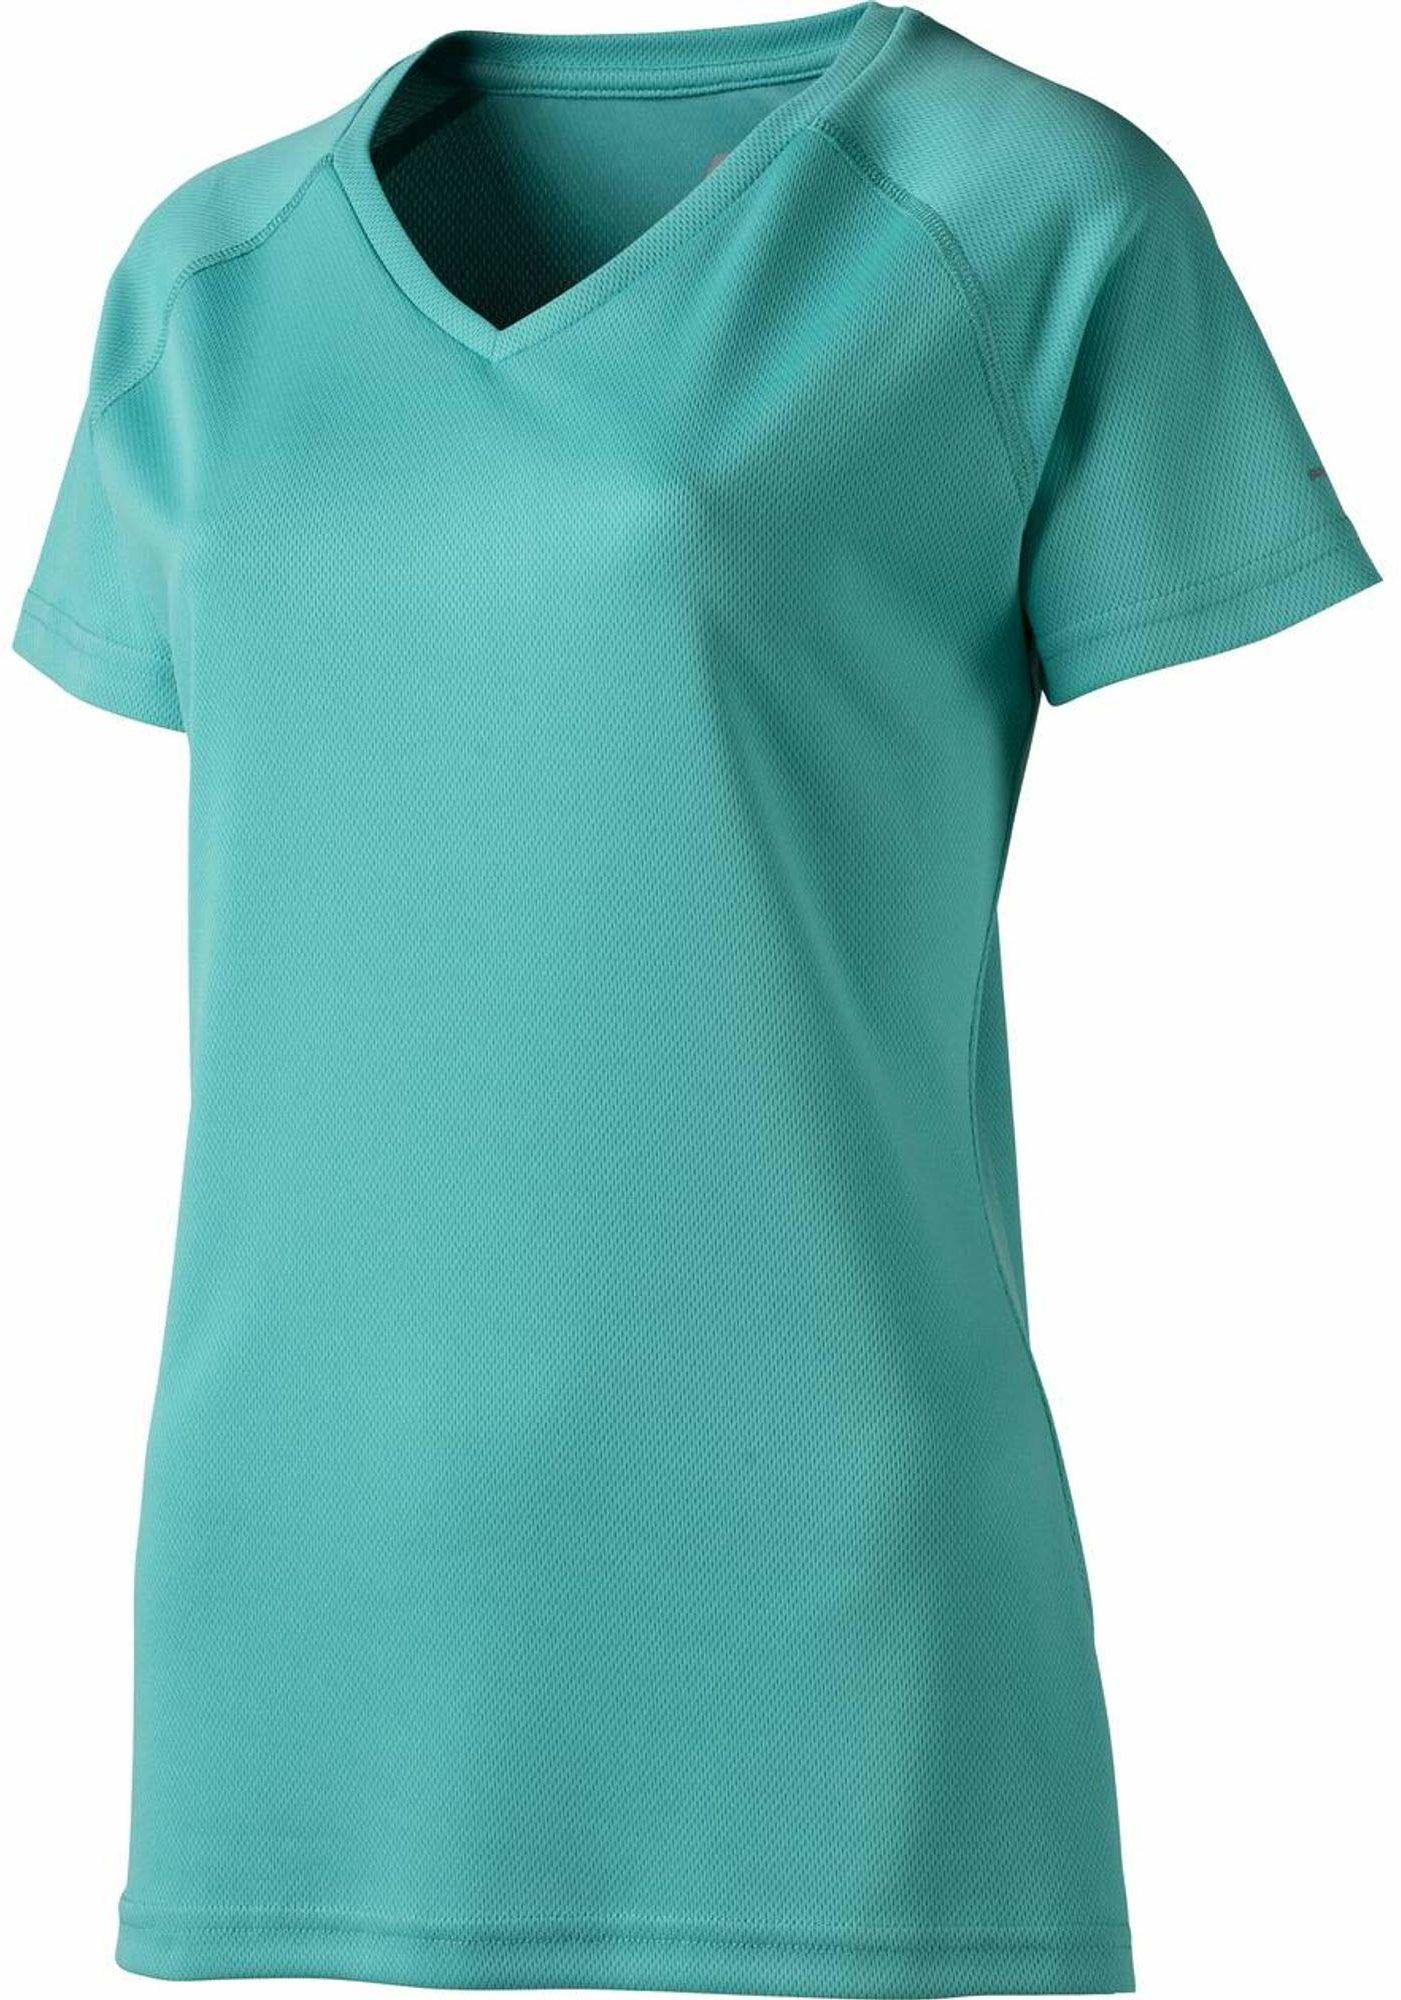 Pro Touch Natalia III T-shirt, miętowy Dark, 36